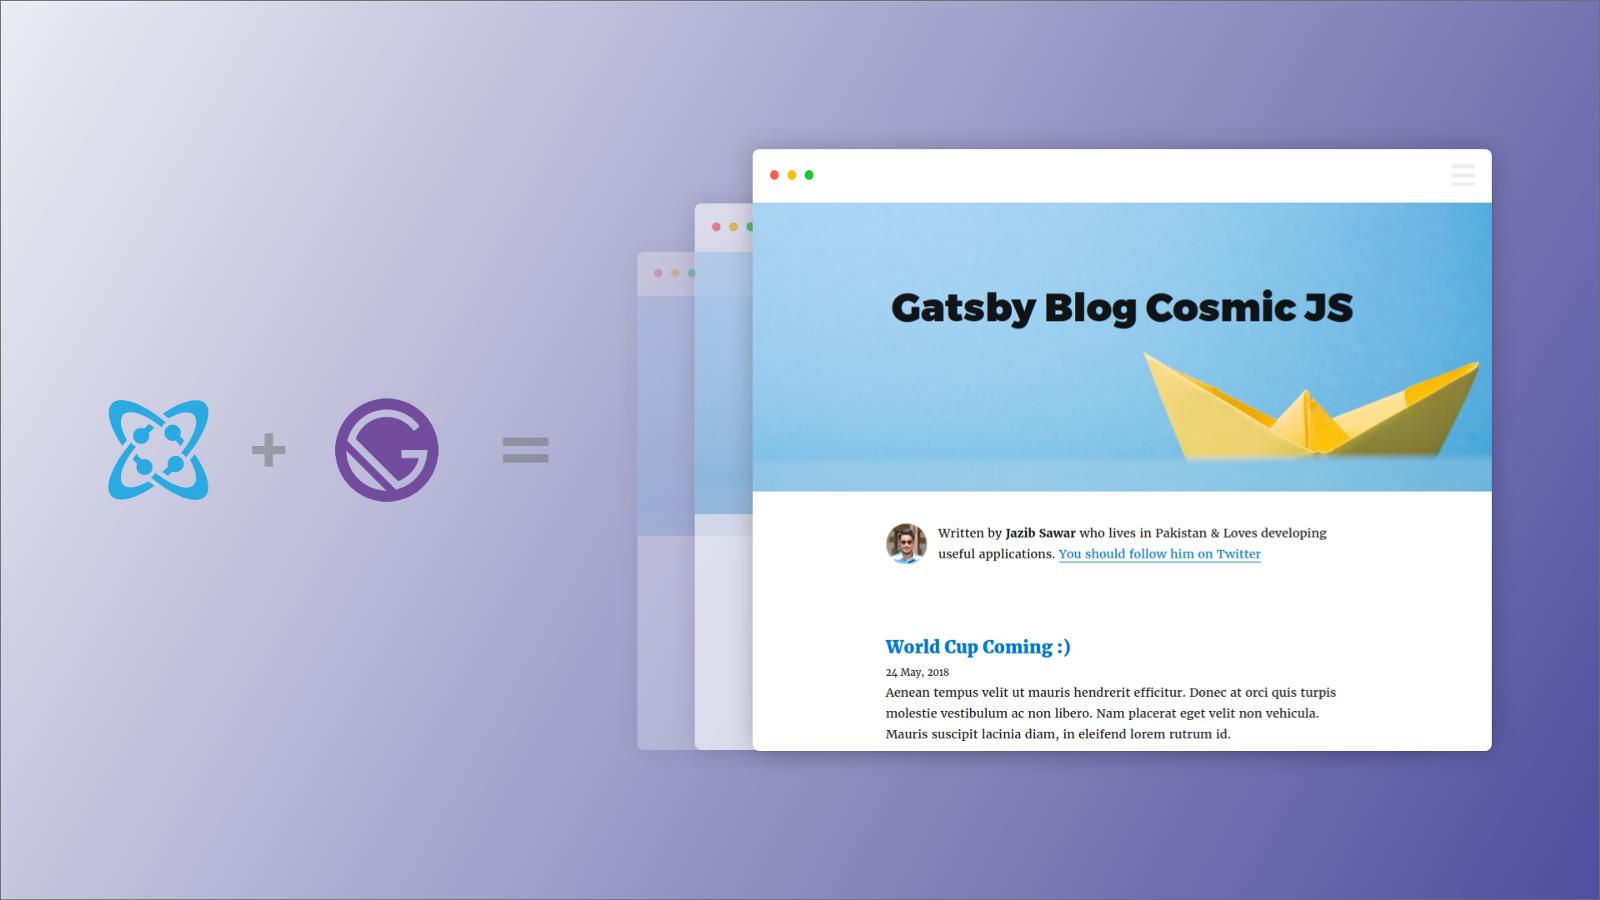 Install a Gatsby Blog built using React, GraphQL and Cosmic